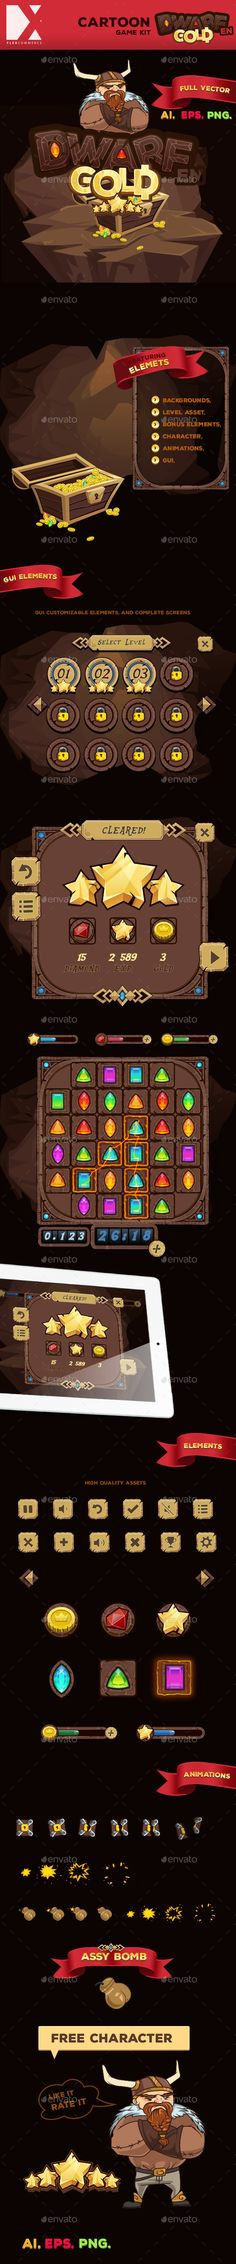 Dwarfen - Game Kit Layered PNG, Vector EPS, AI Illustrator. Download here: https://graphicriver.net/item/dwarfen-game-kit/10242978?ref=ksioks